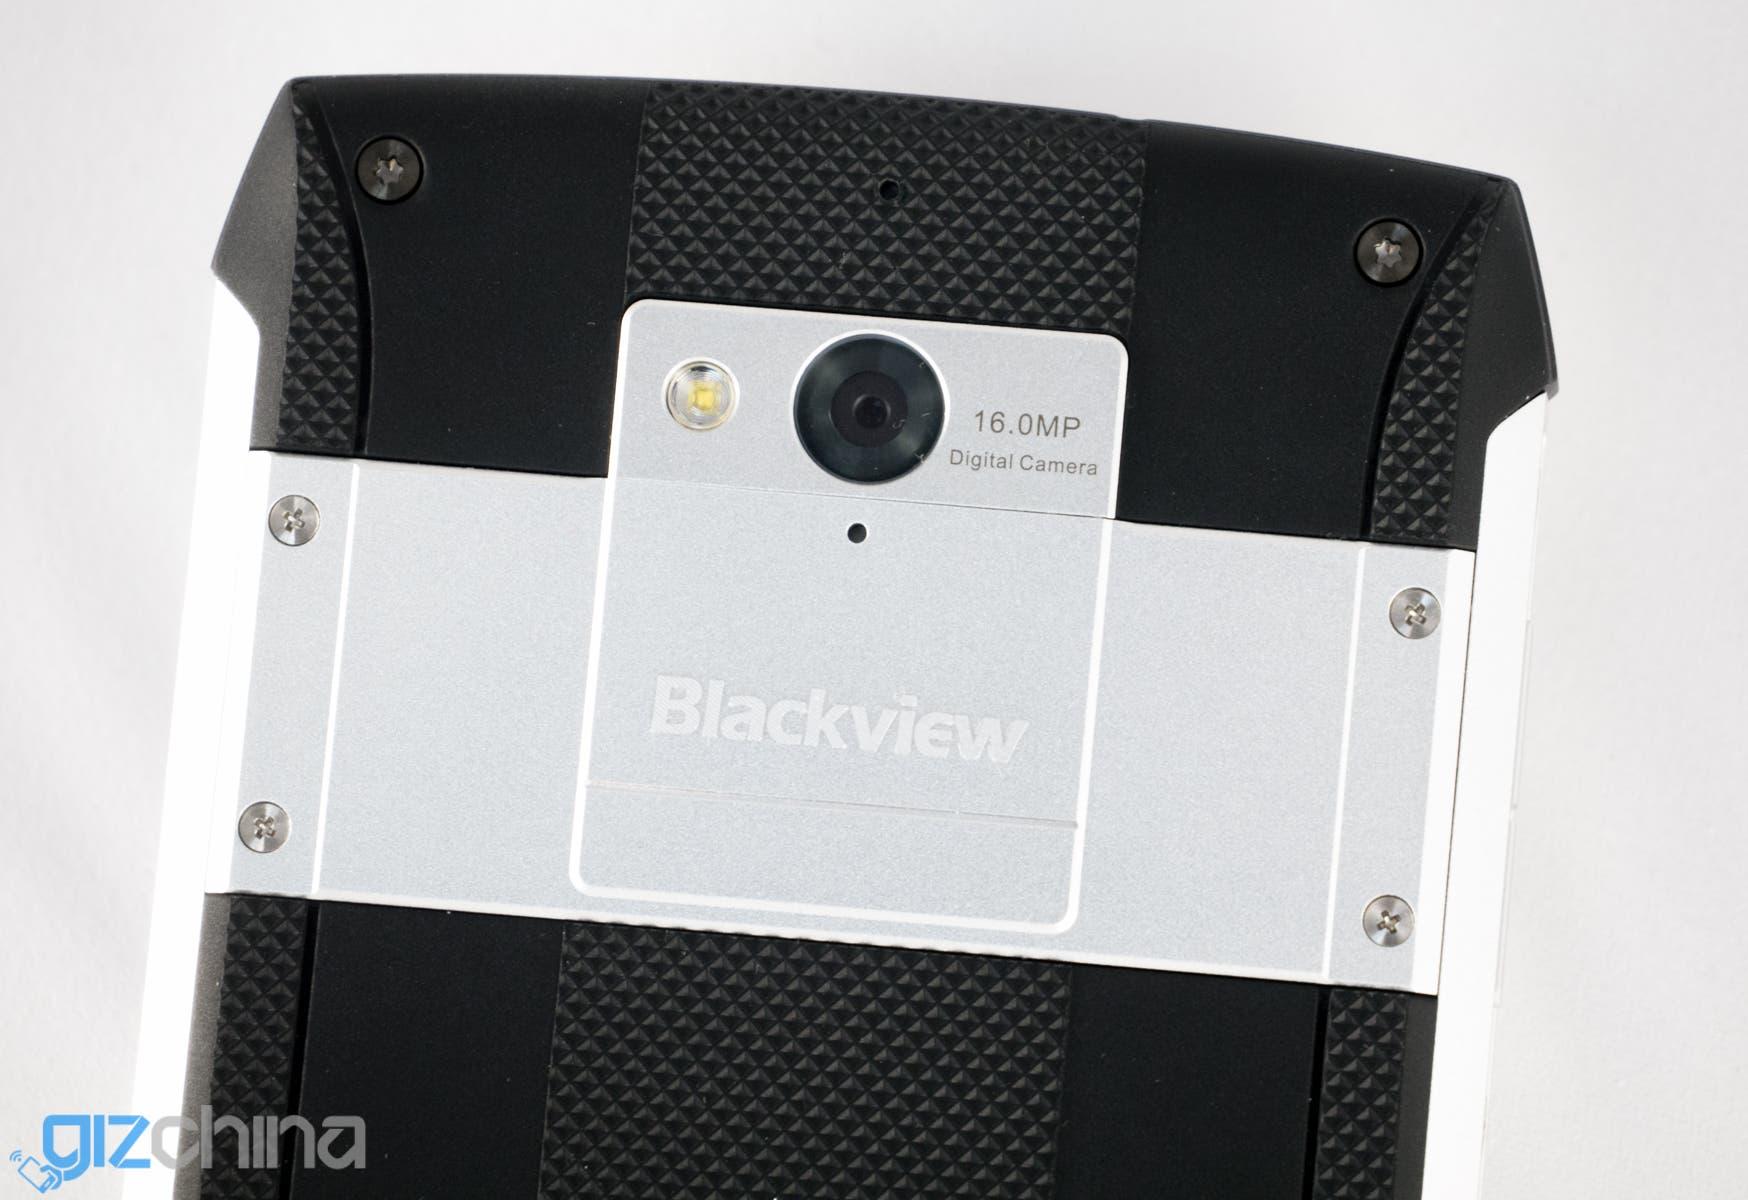 Blackview BV8000 Pro Review